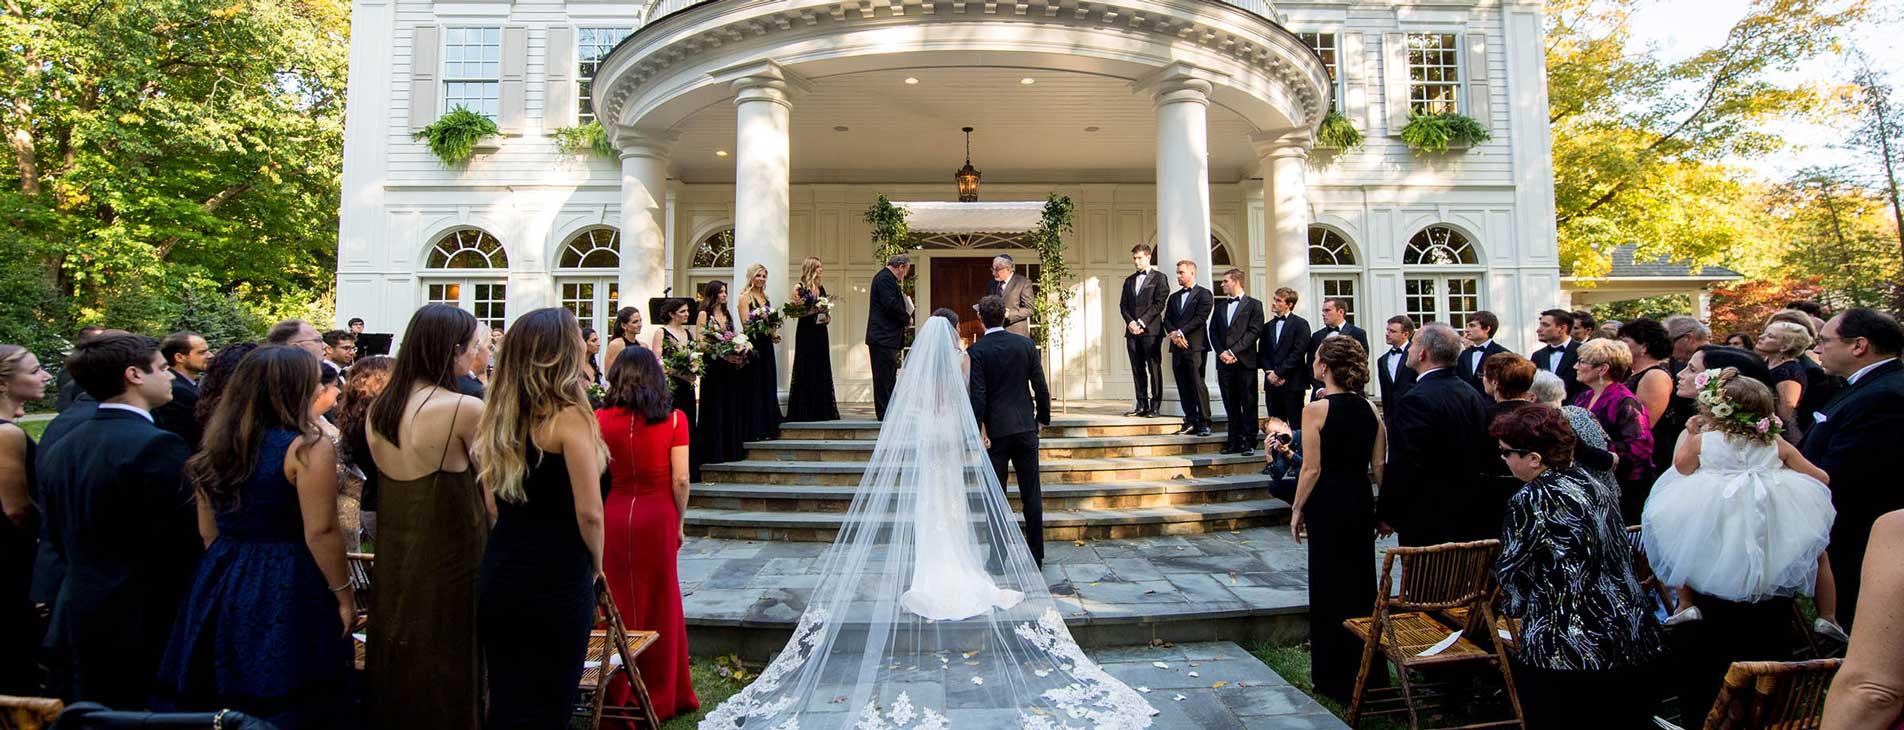 Wedding Ceremony north of Indianapolis Indiana